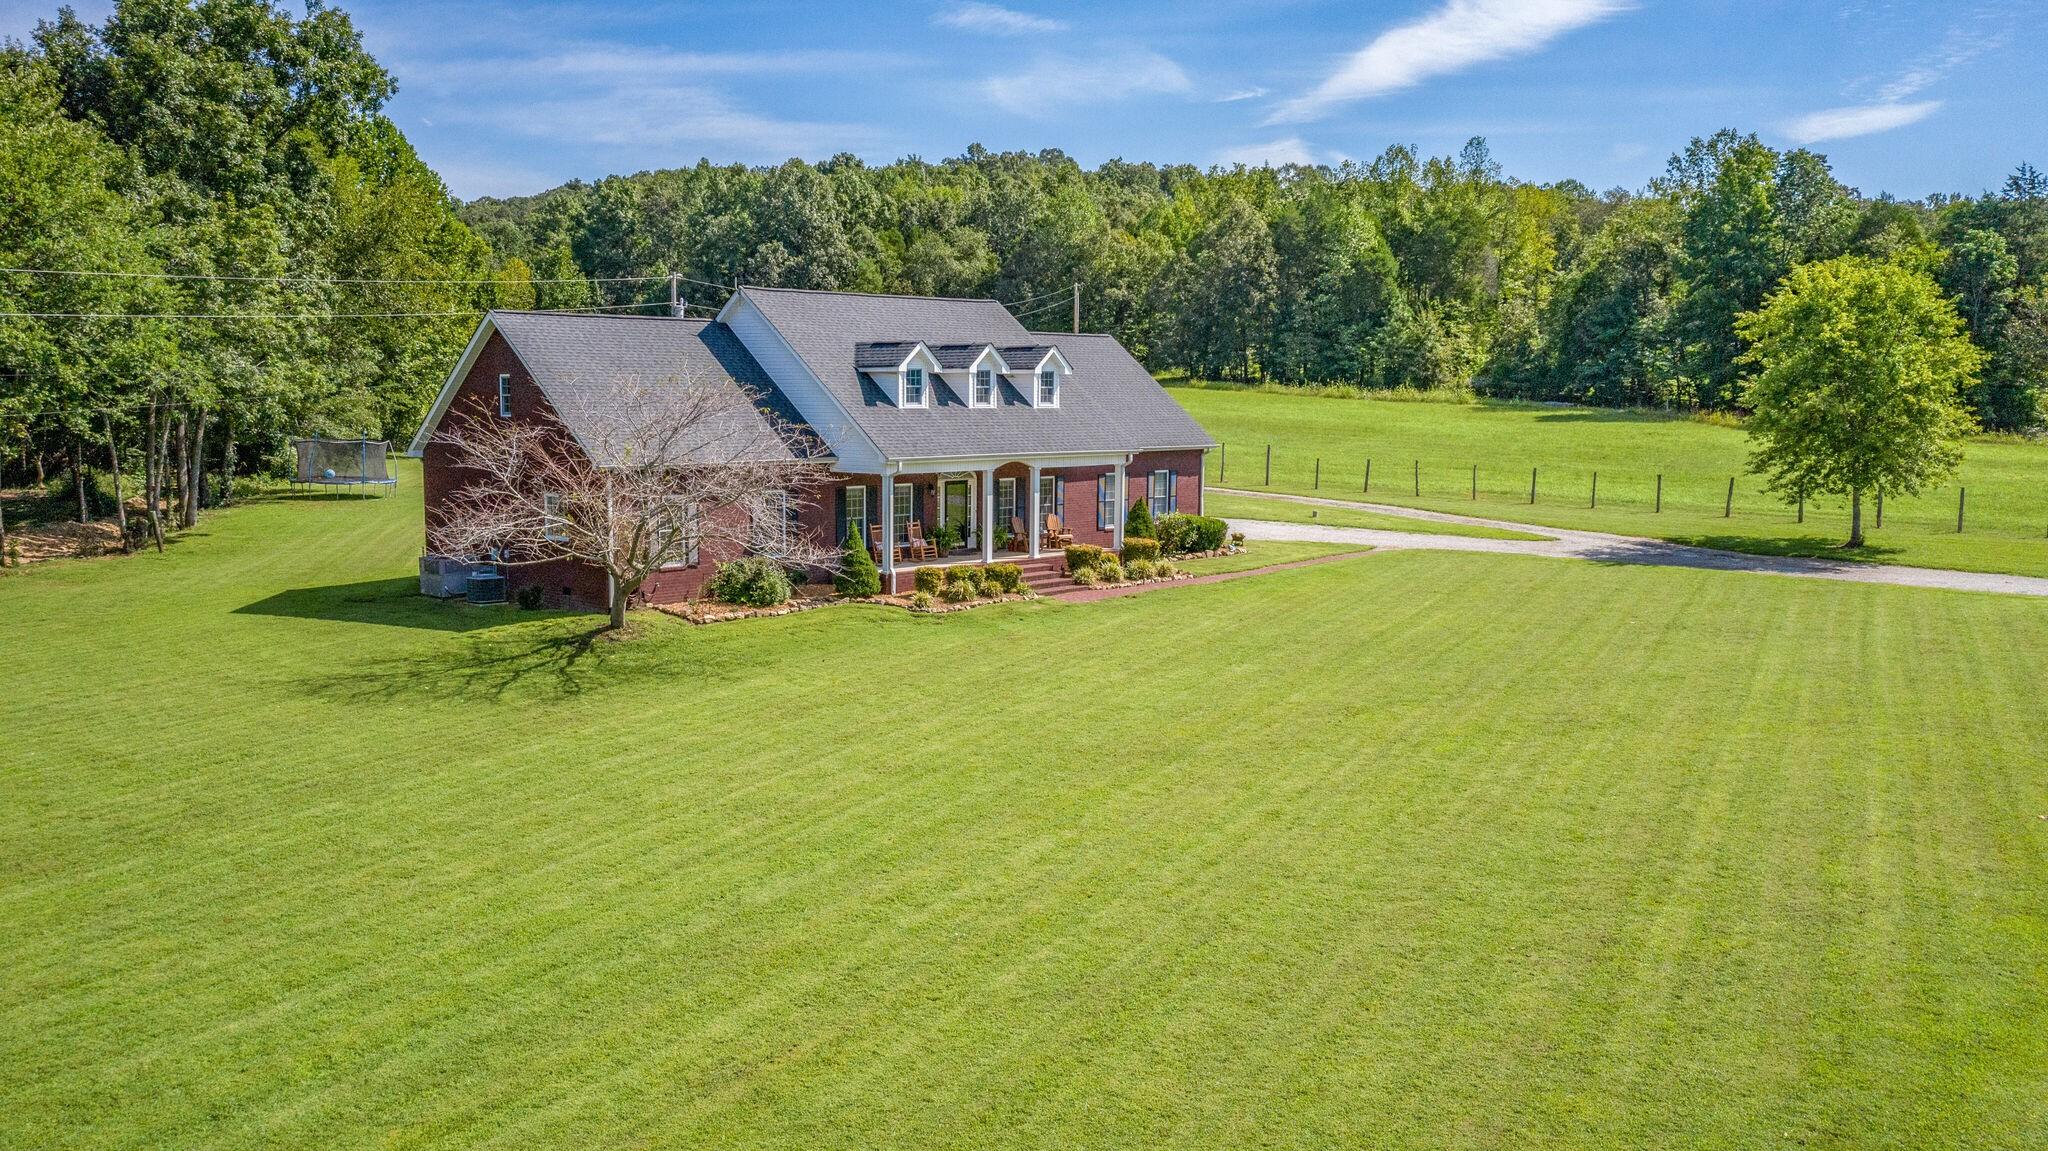 5151 East Blue Creek Road Property Photo - MC EWEN, TN real estate listing